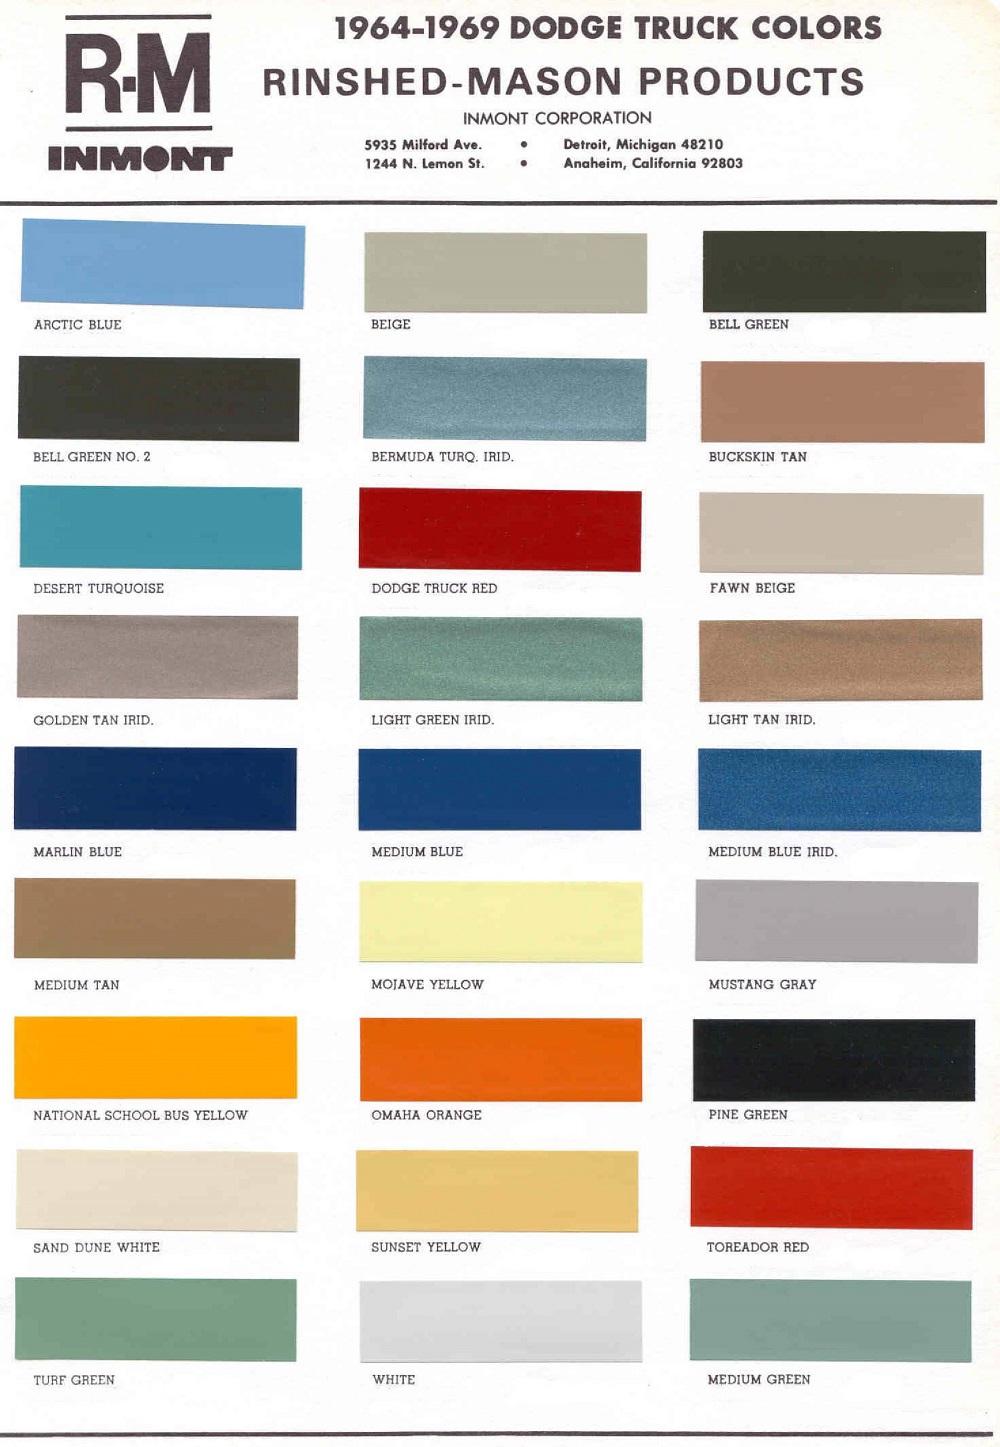 Dodge Truck Colors Wiring Diagrams 1964 Color Chips Vintage Chrysler Plymouth Paint Rh Vintagepaint Biz 2019